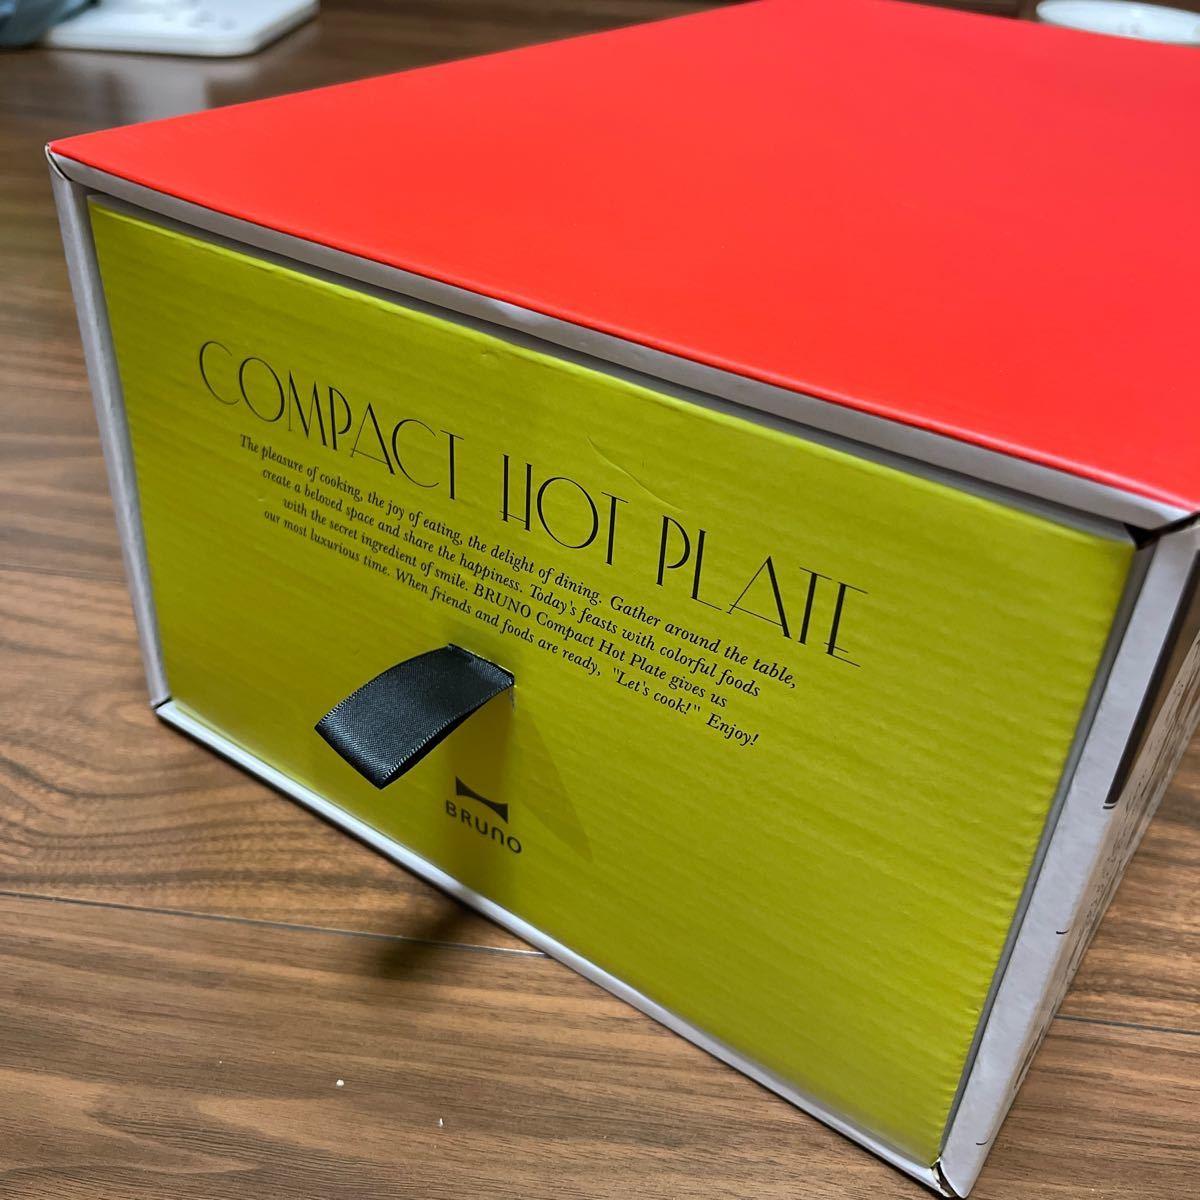 BRUNO コンパクトホットプレート BOE021-HW(ホワイト)